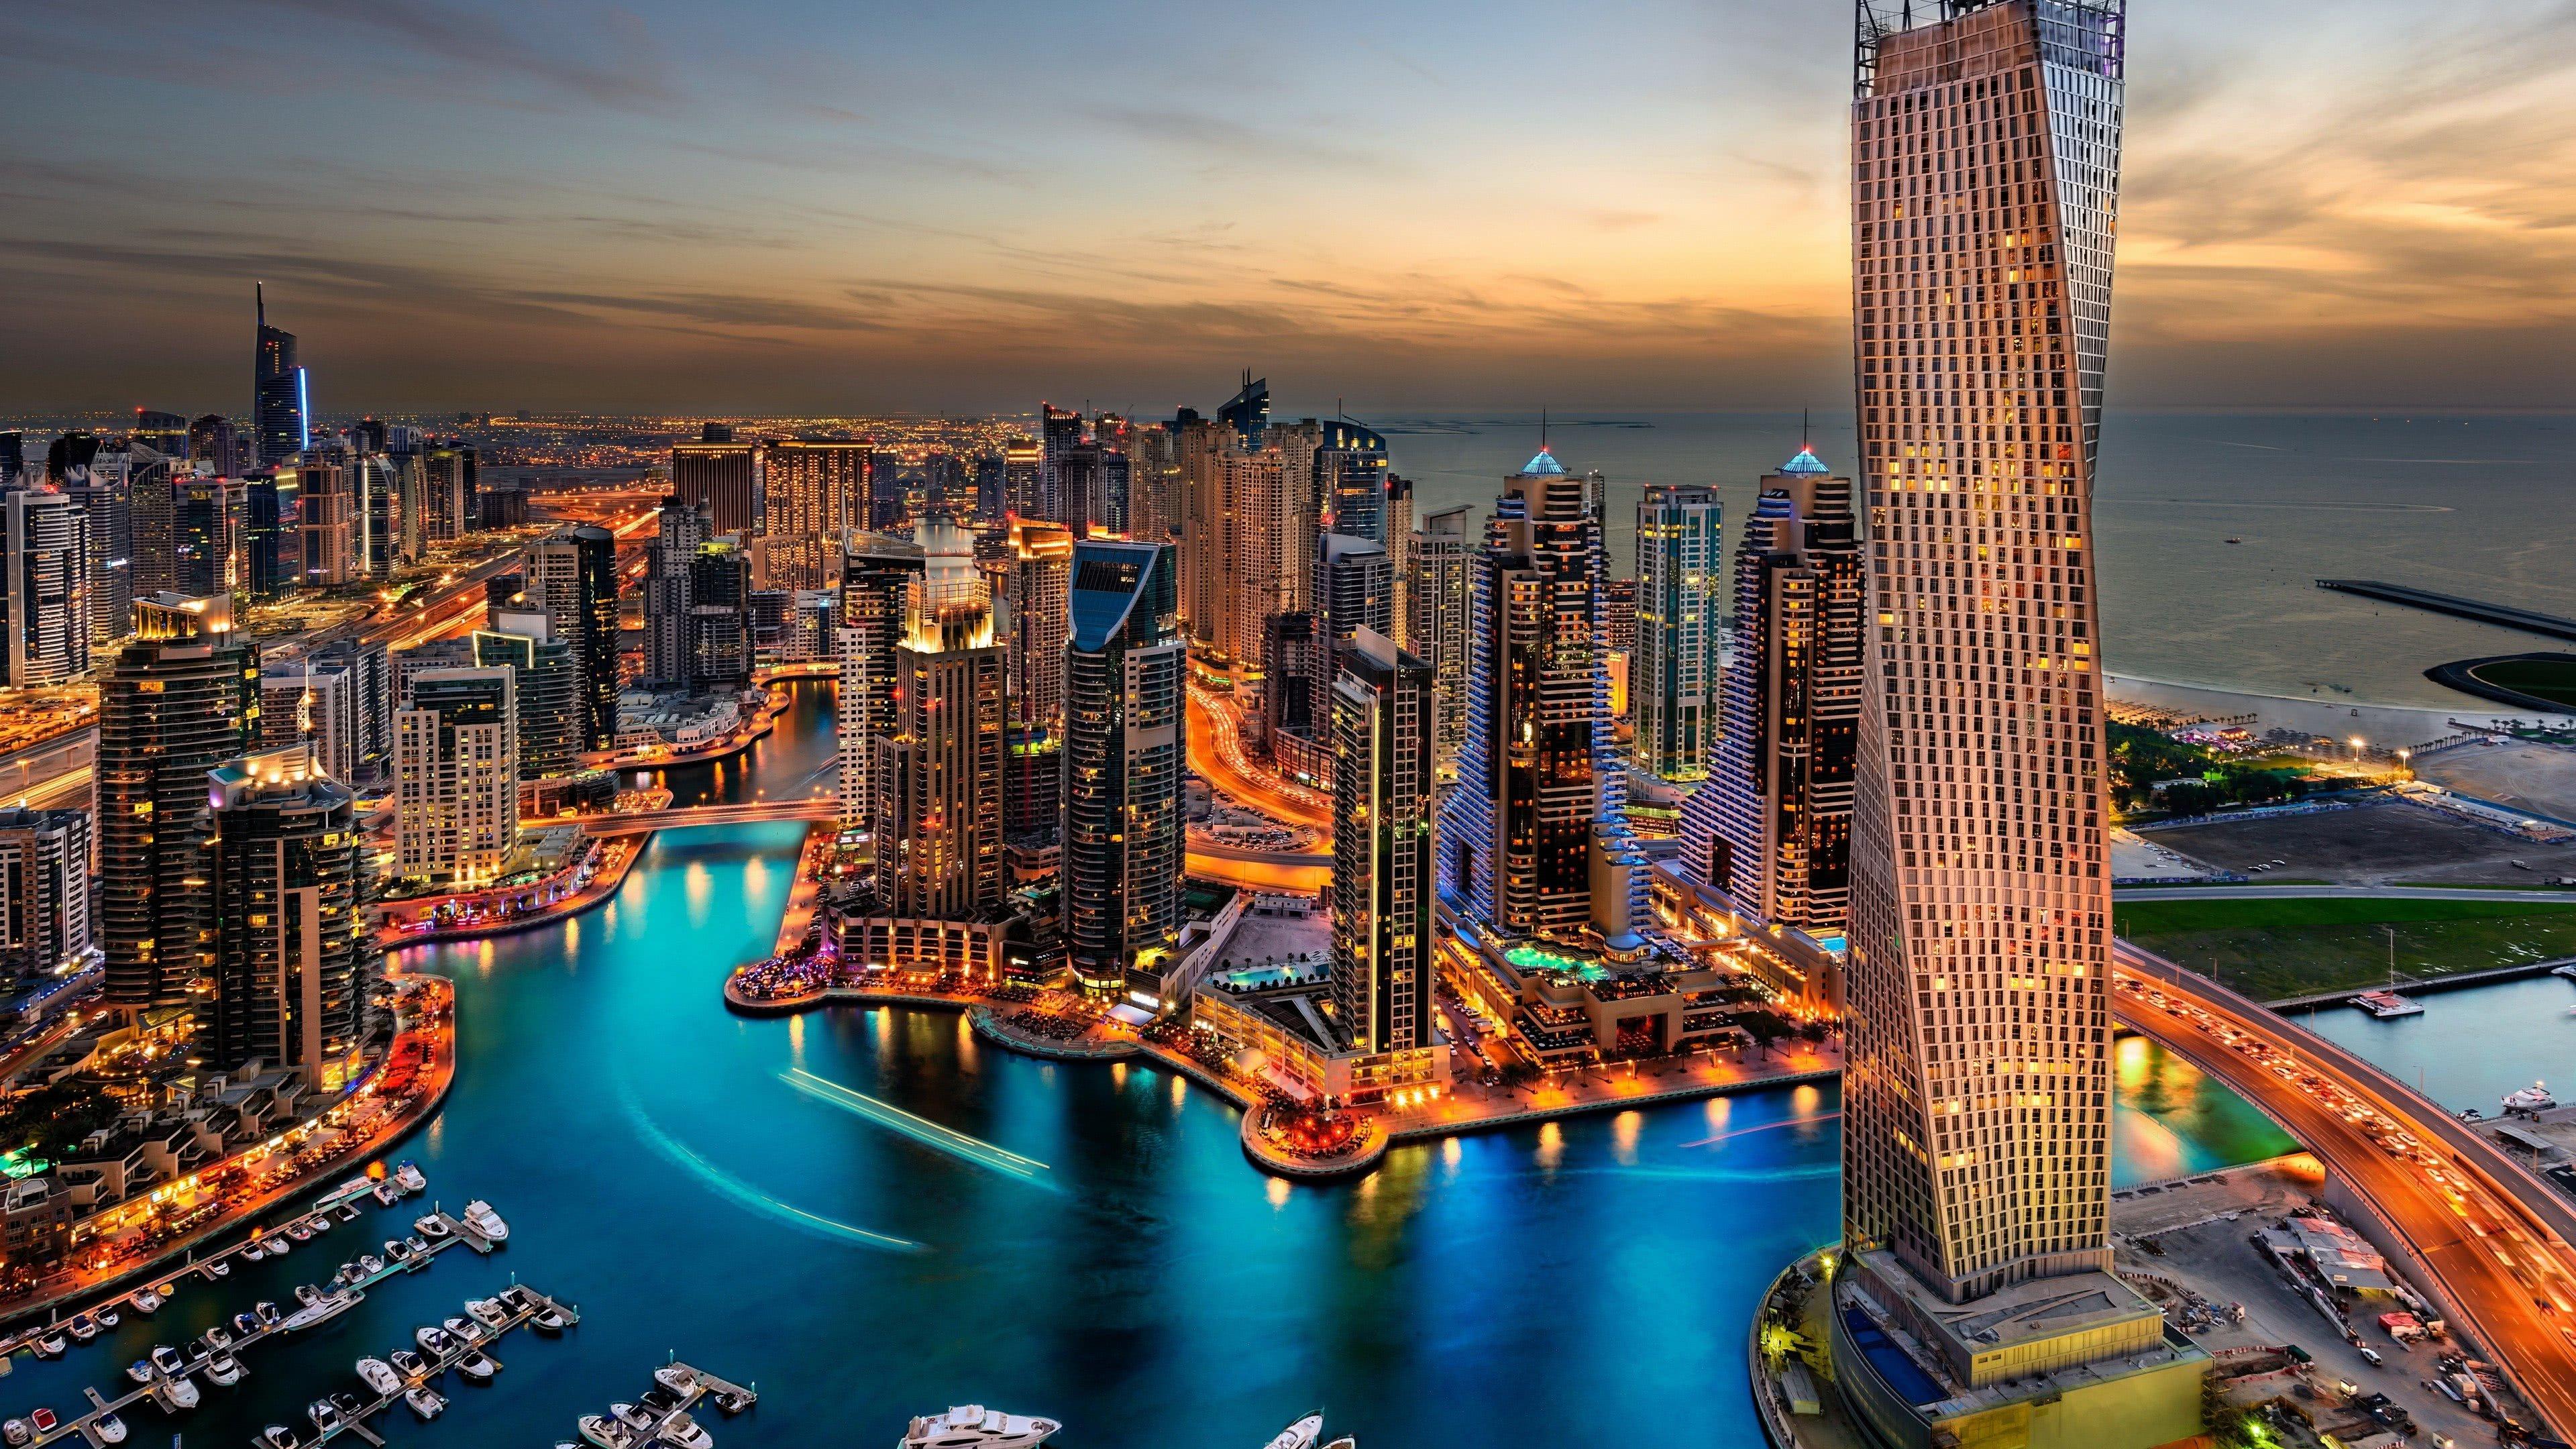 dubai skyscrapers, united arab emirates uhd 4k wallpaper | pixelz